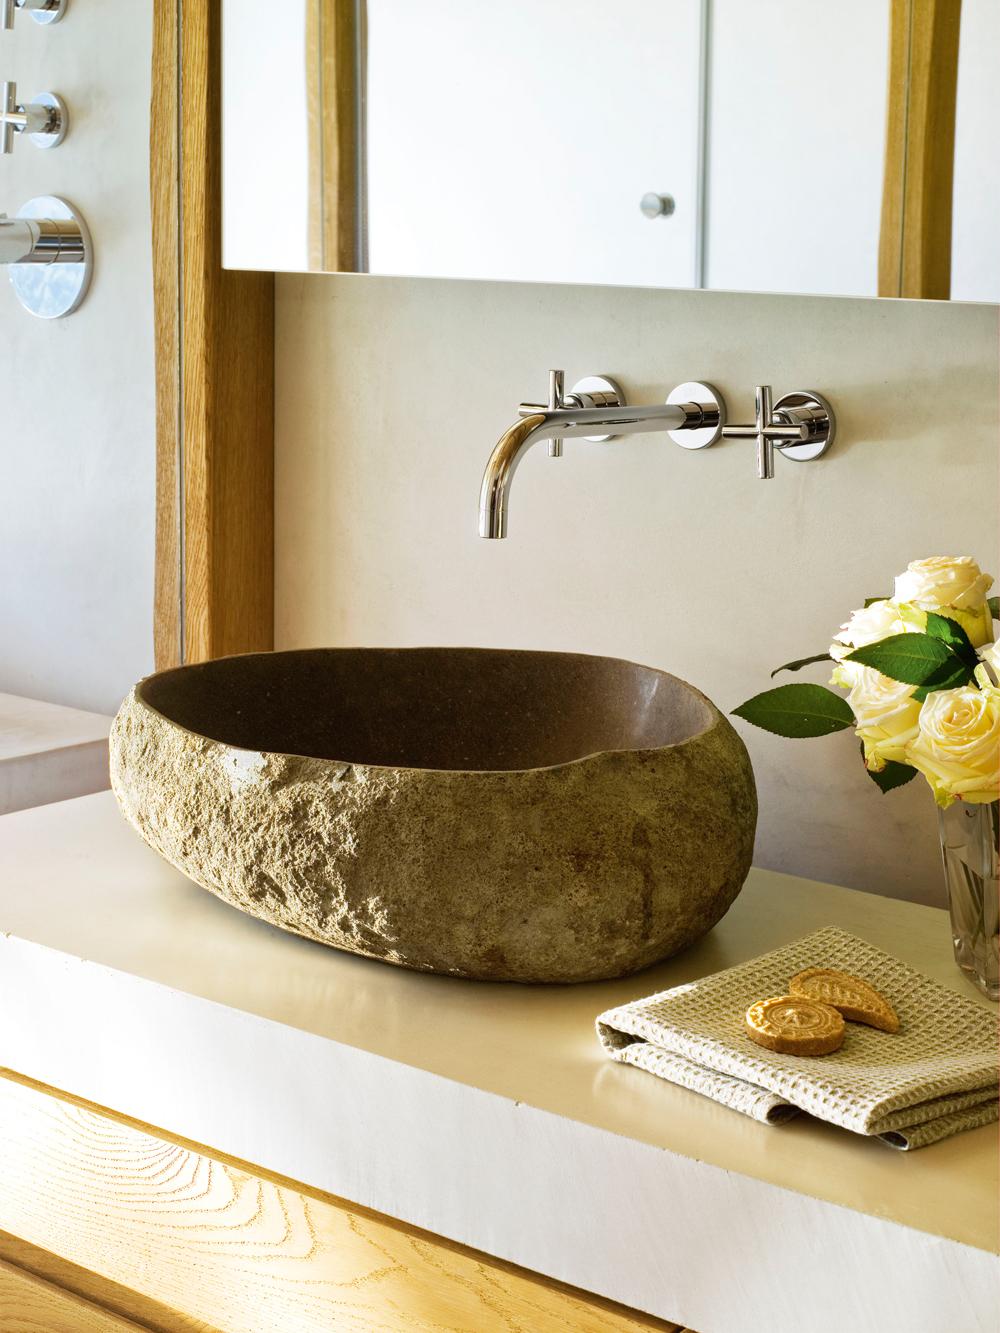 Un lavamanos para cada ba o - Lavamanos de piedra ...